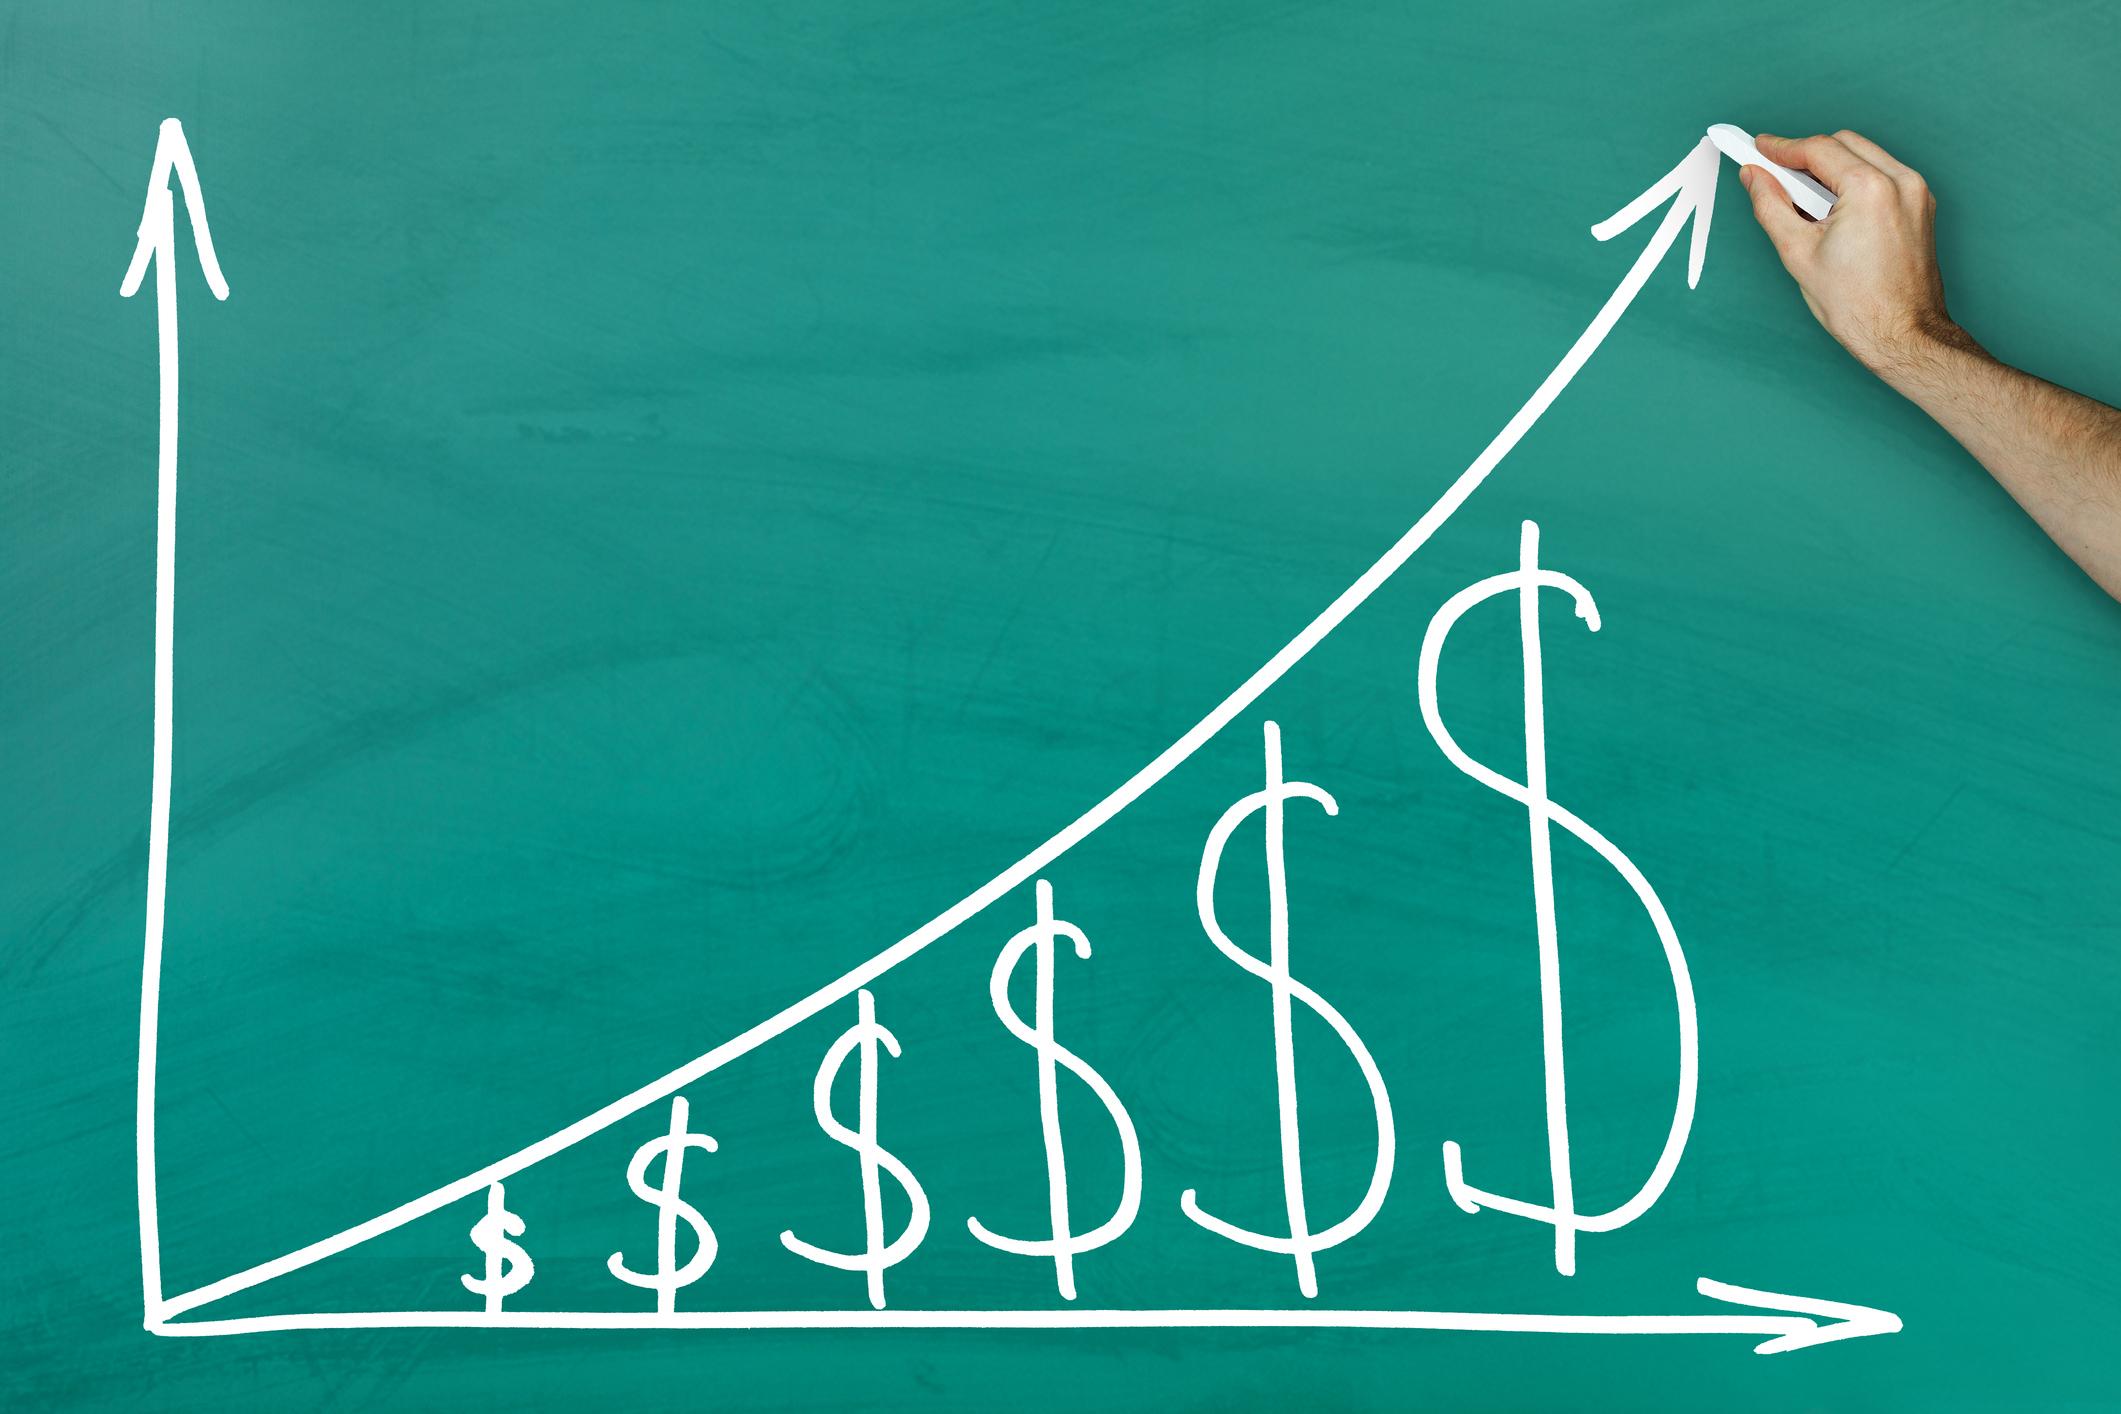 Graph of dollar bills getting bigger